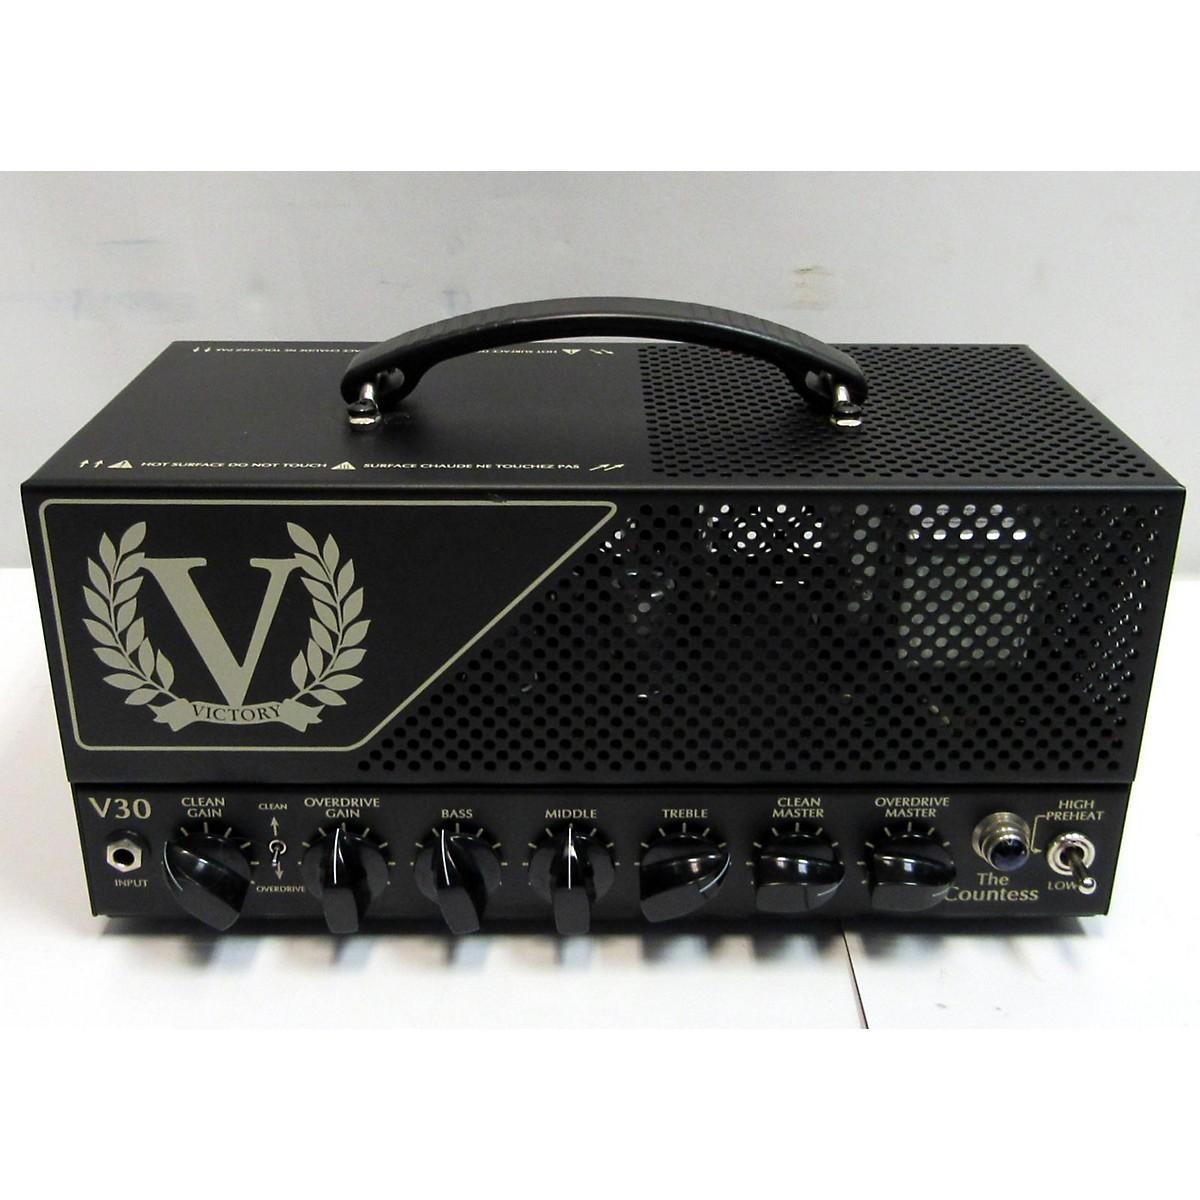 Victory V30 The Countess Tube Guitar Amp Head